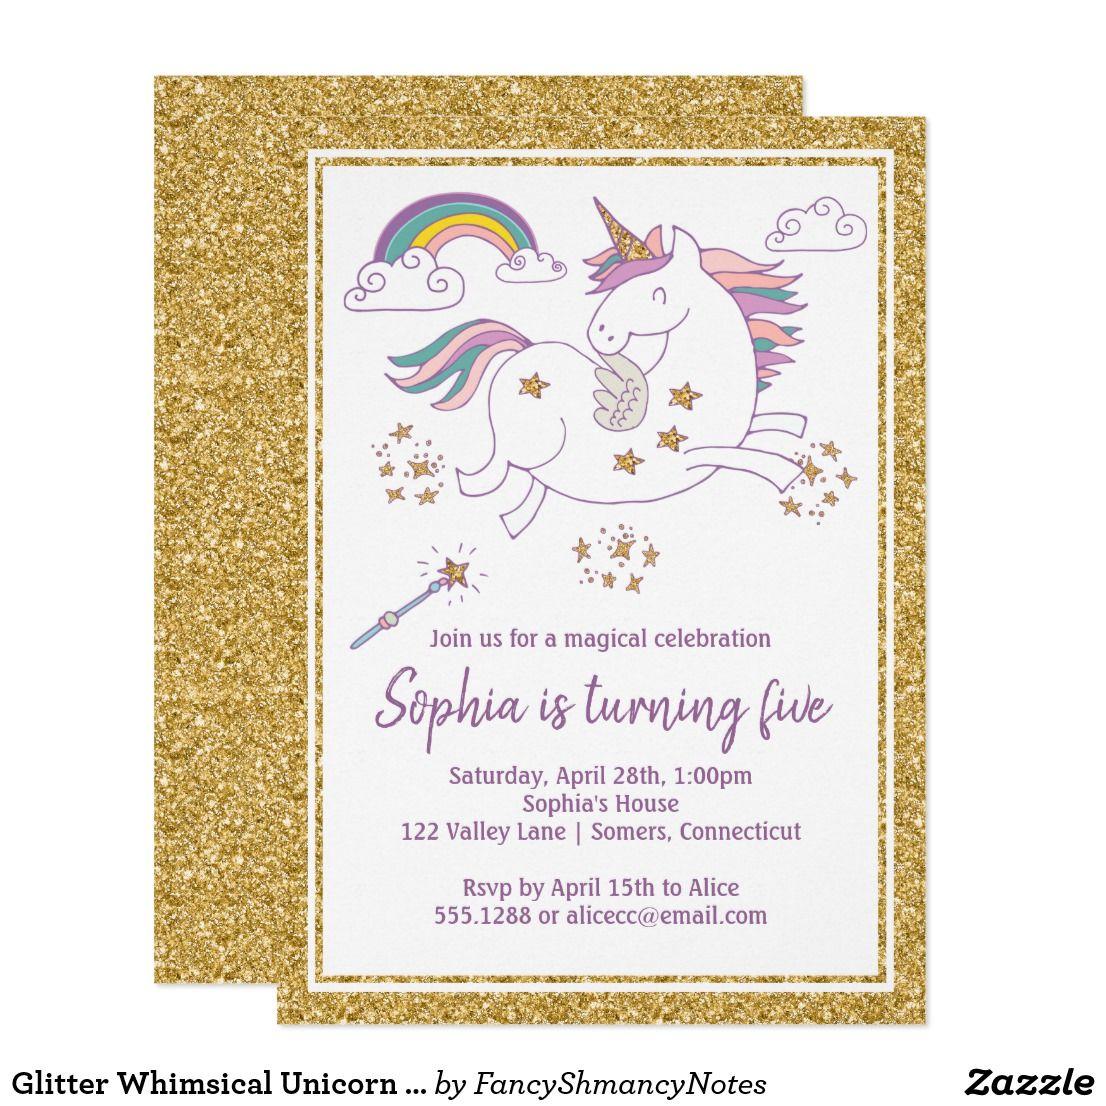 Glitter Whimsical Unicorn Birthday Invitation Zazzle Com With